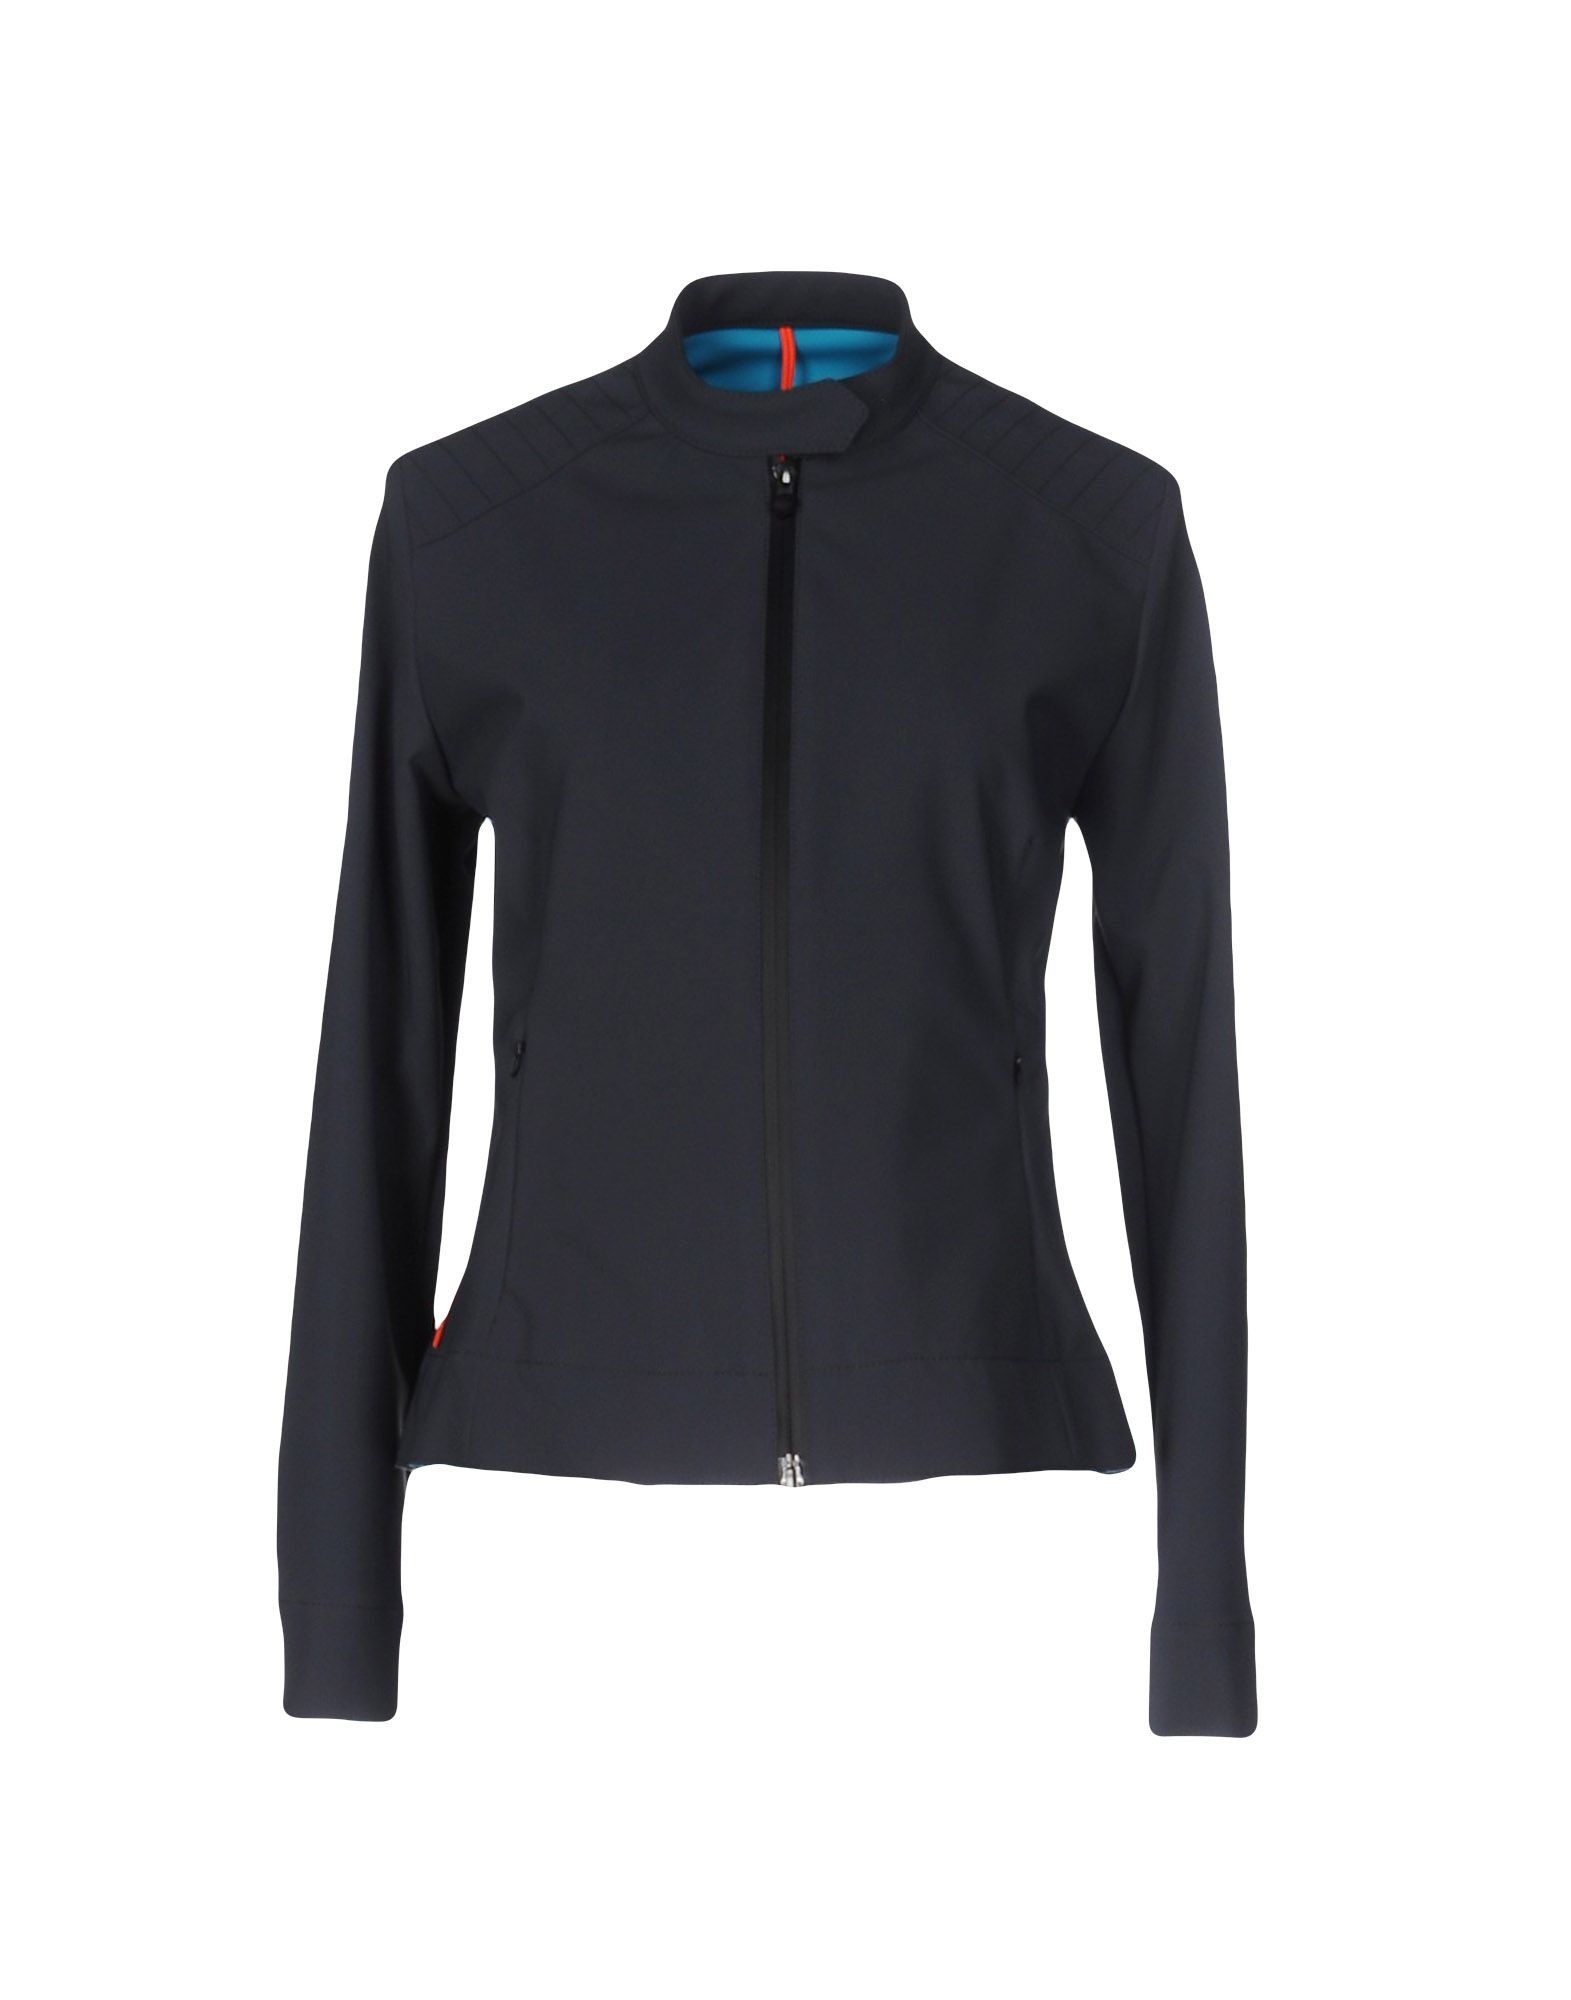 RRD Damen Jacke Farbe Blei Größe 6 jetztbilligerkaufen